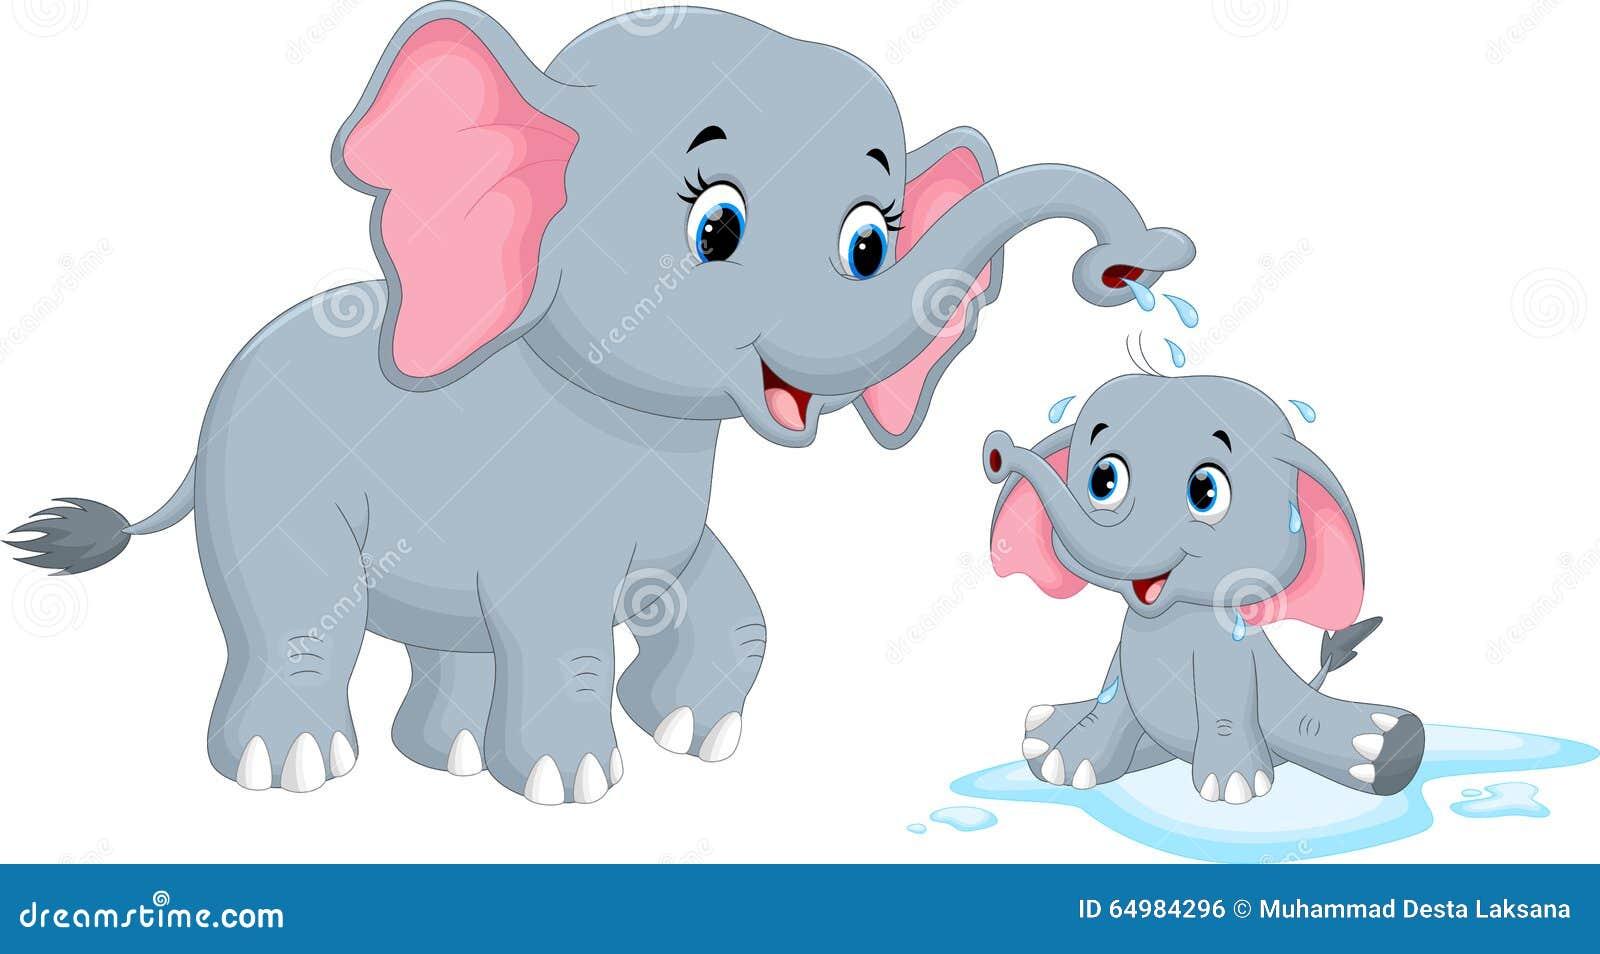 Cartoon mother elephants bathing her child